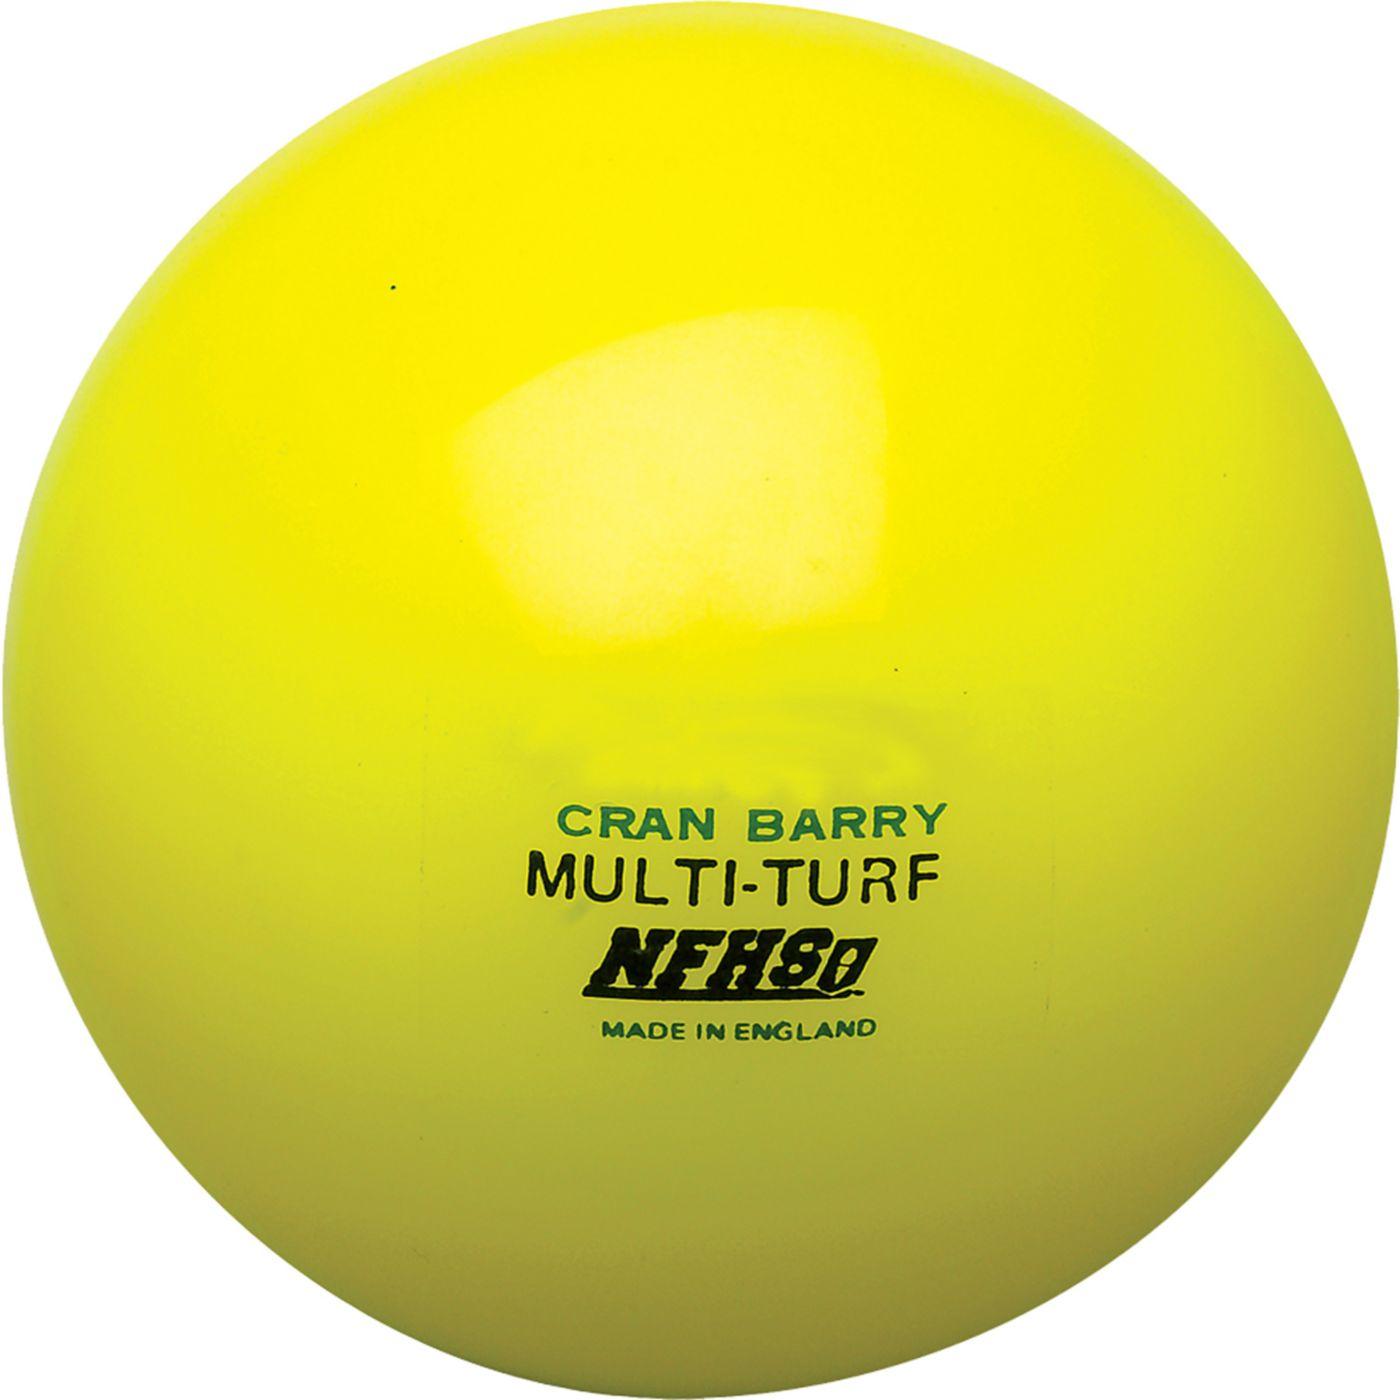 CranBarry Hollow Multi Turf Field Hockey Game Ball